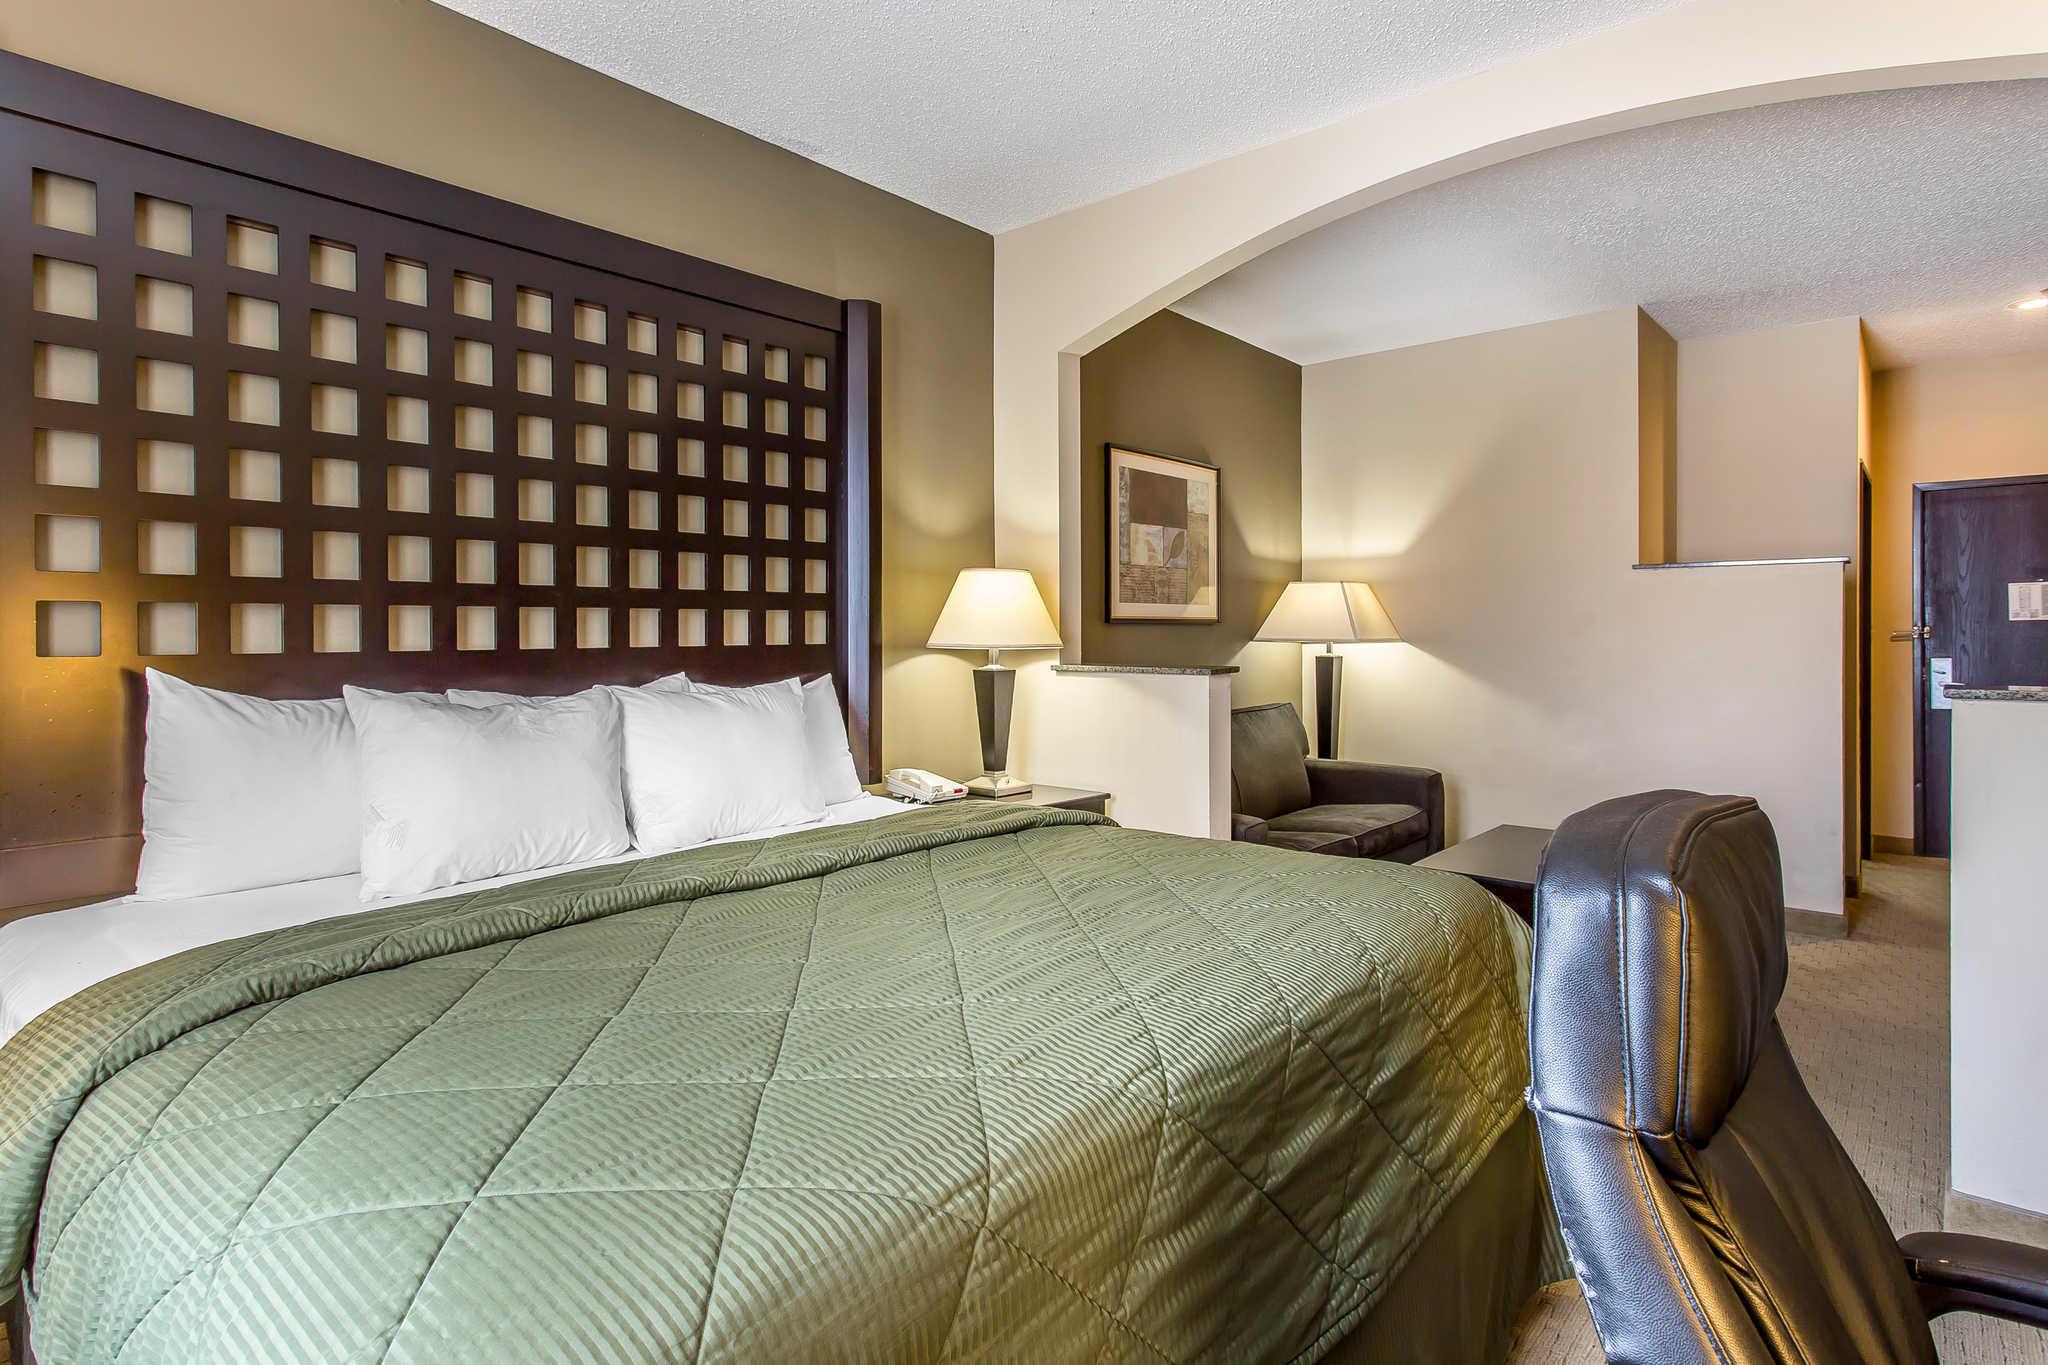 Quality Inn & Suites Durant image 17